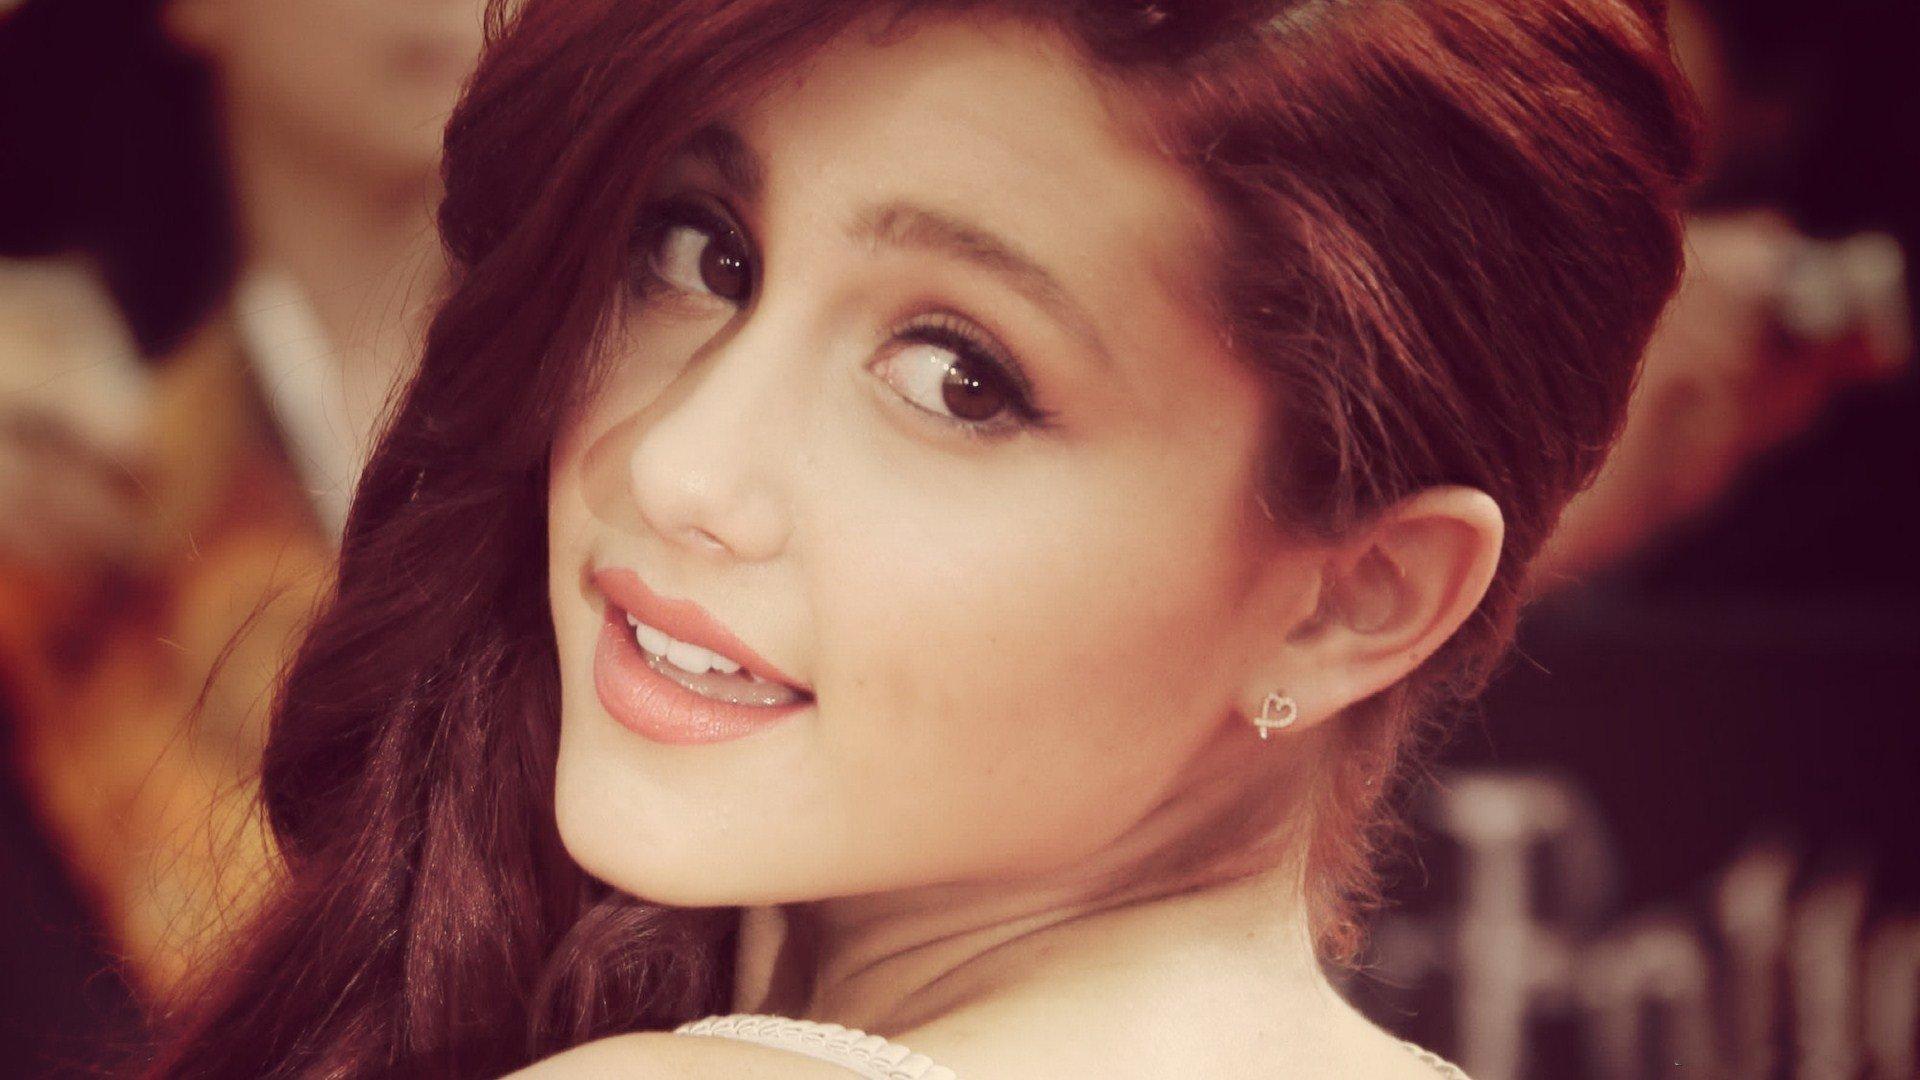 Hd Wallpaper - Ariana Grande Cute Hd , HD Wallpaper & Backgrounds